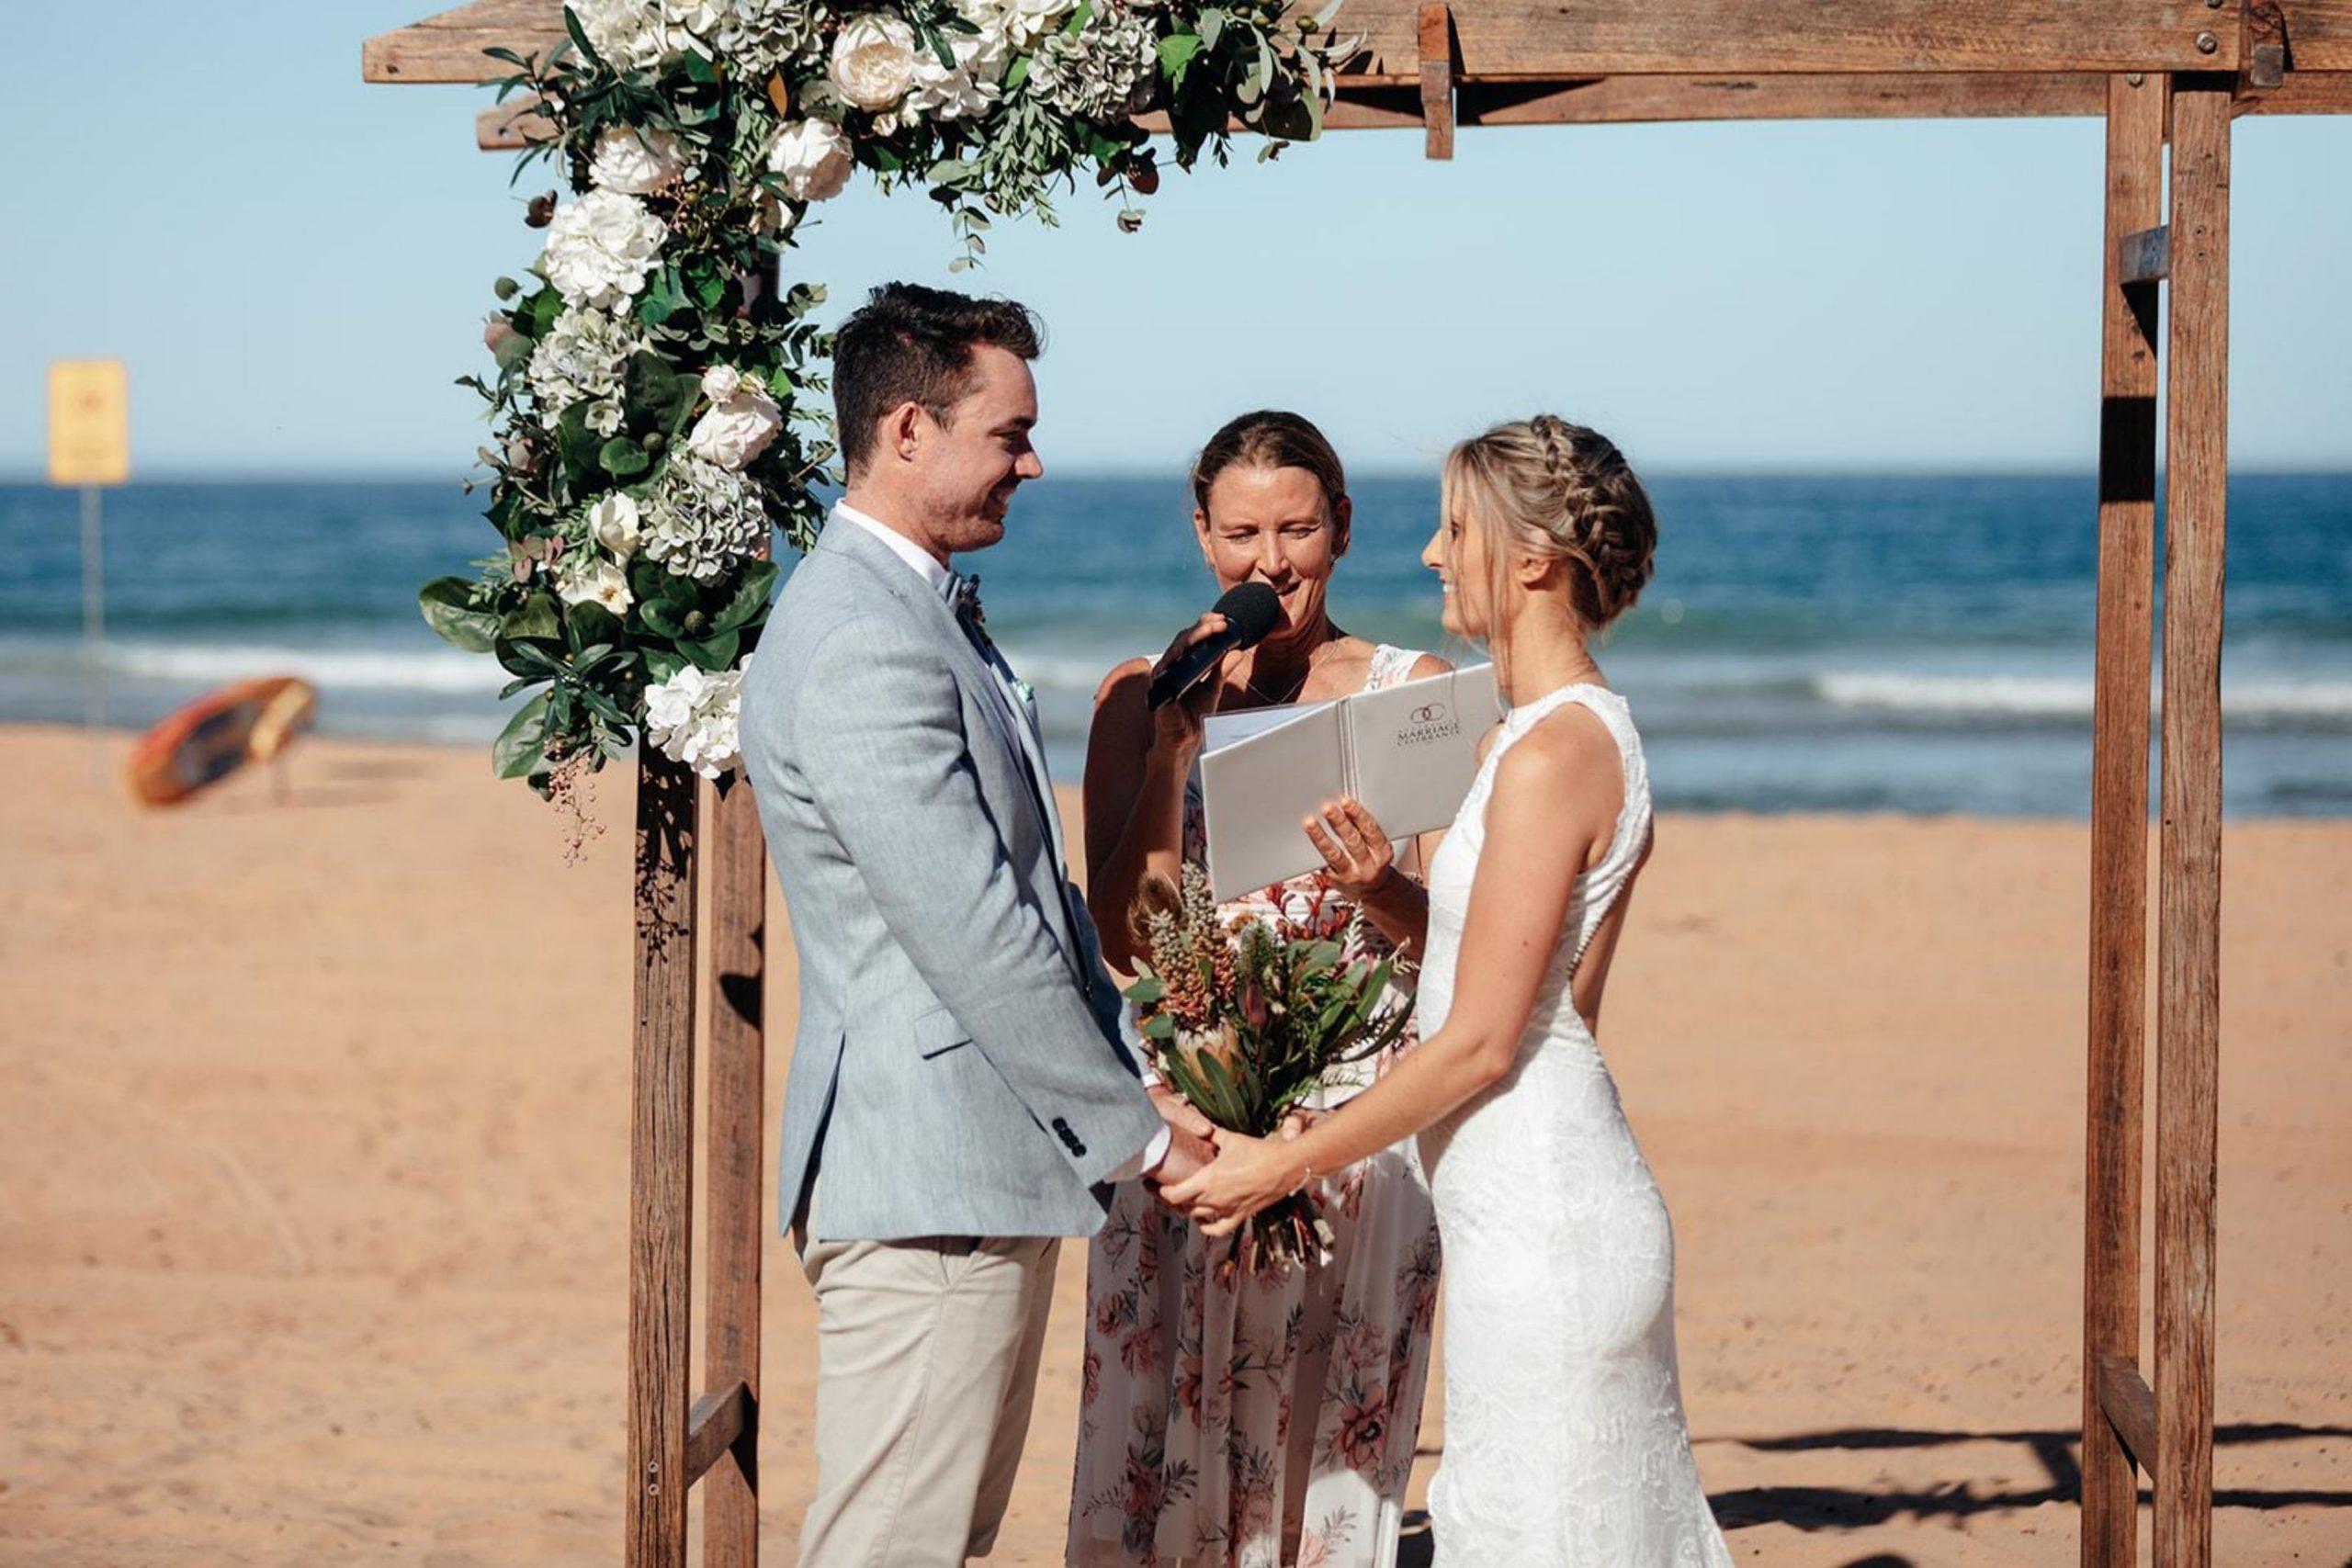 Northern Beaches Marriage Celebrant